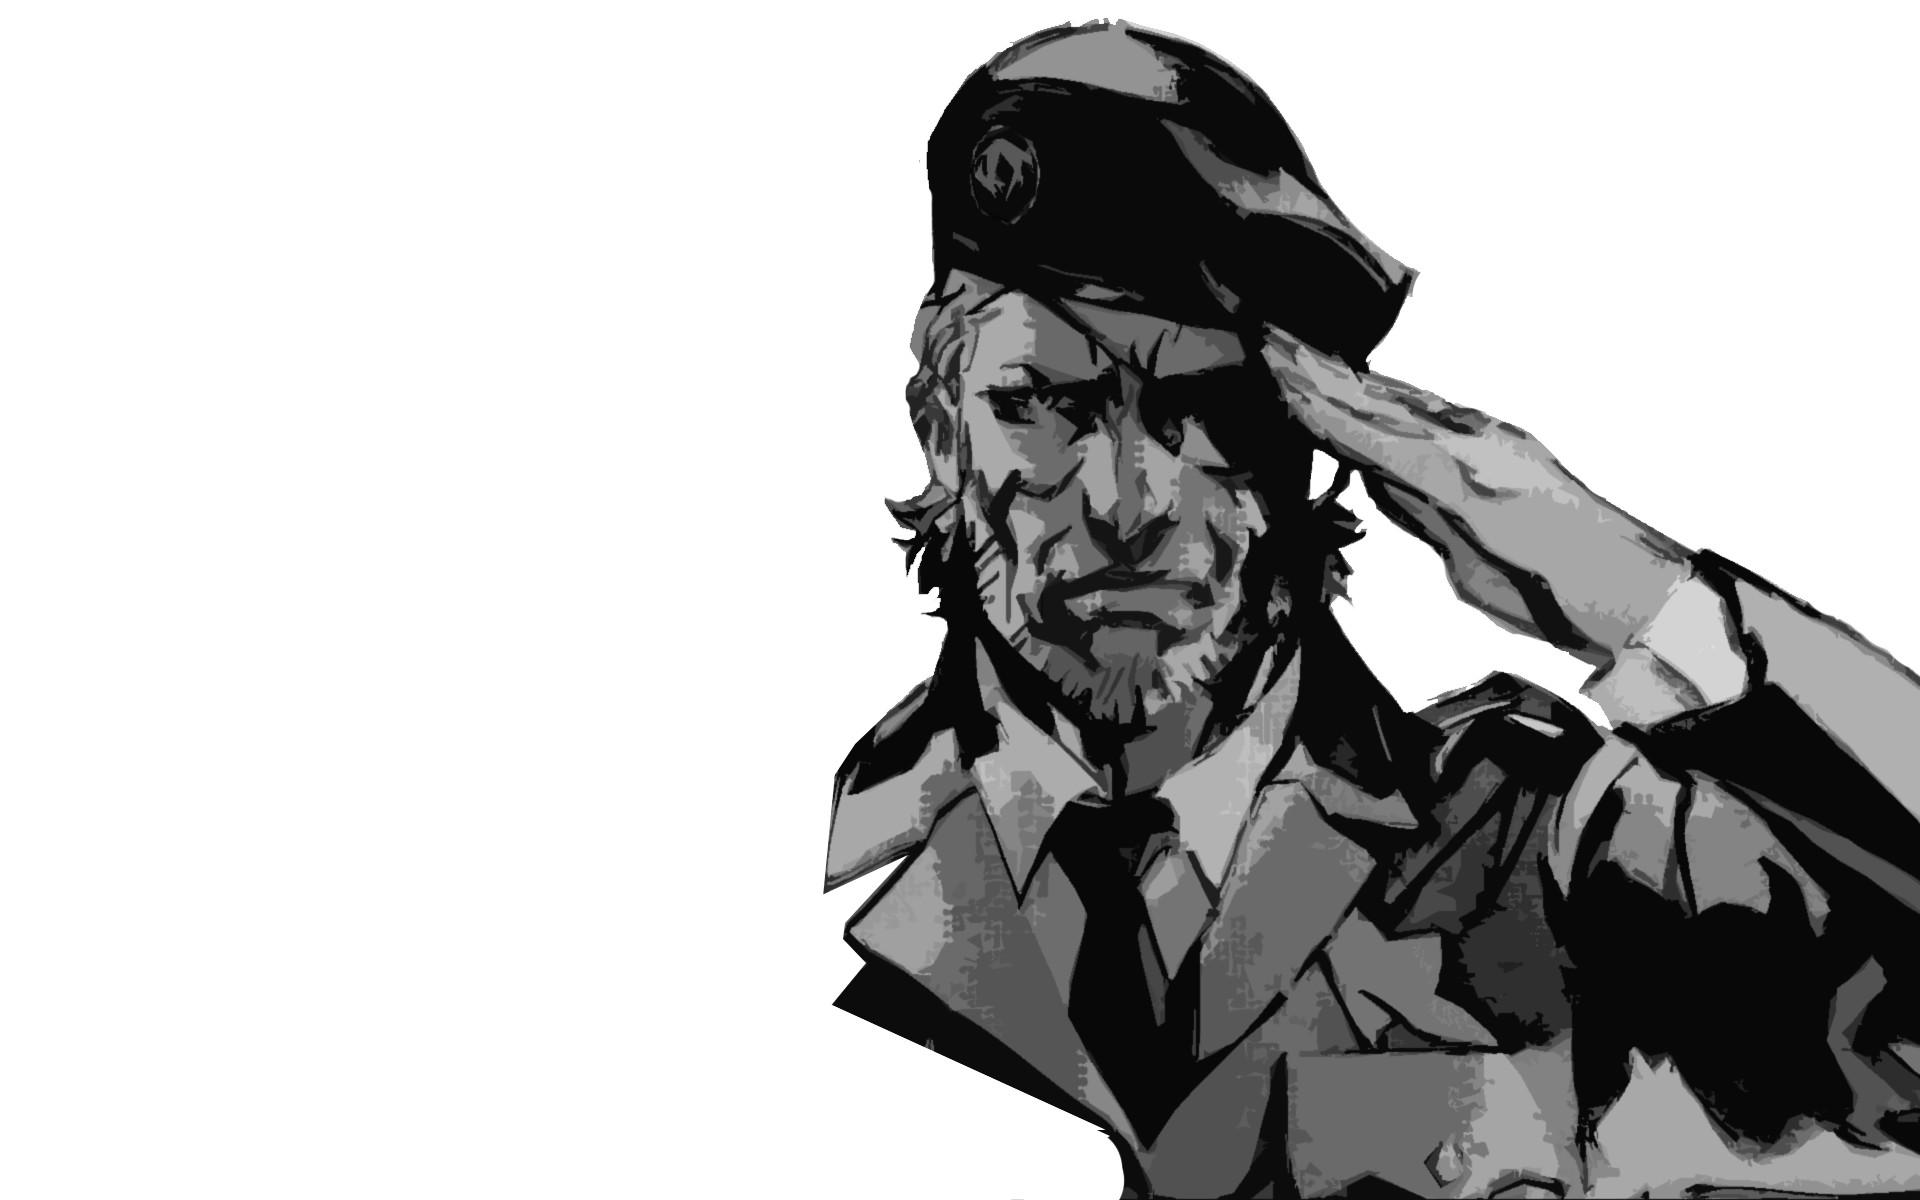 Naked Snake (Big Boss) – Metal Gear Solid 3: Snake Eater #MetalGearSolid3